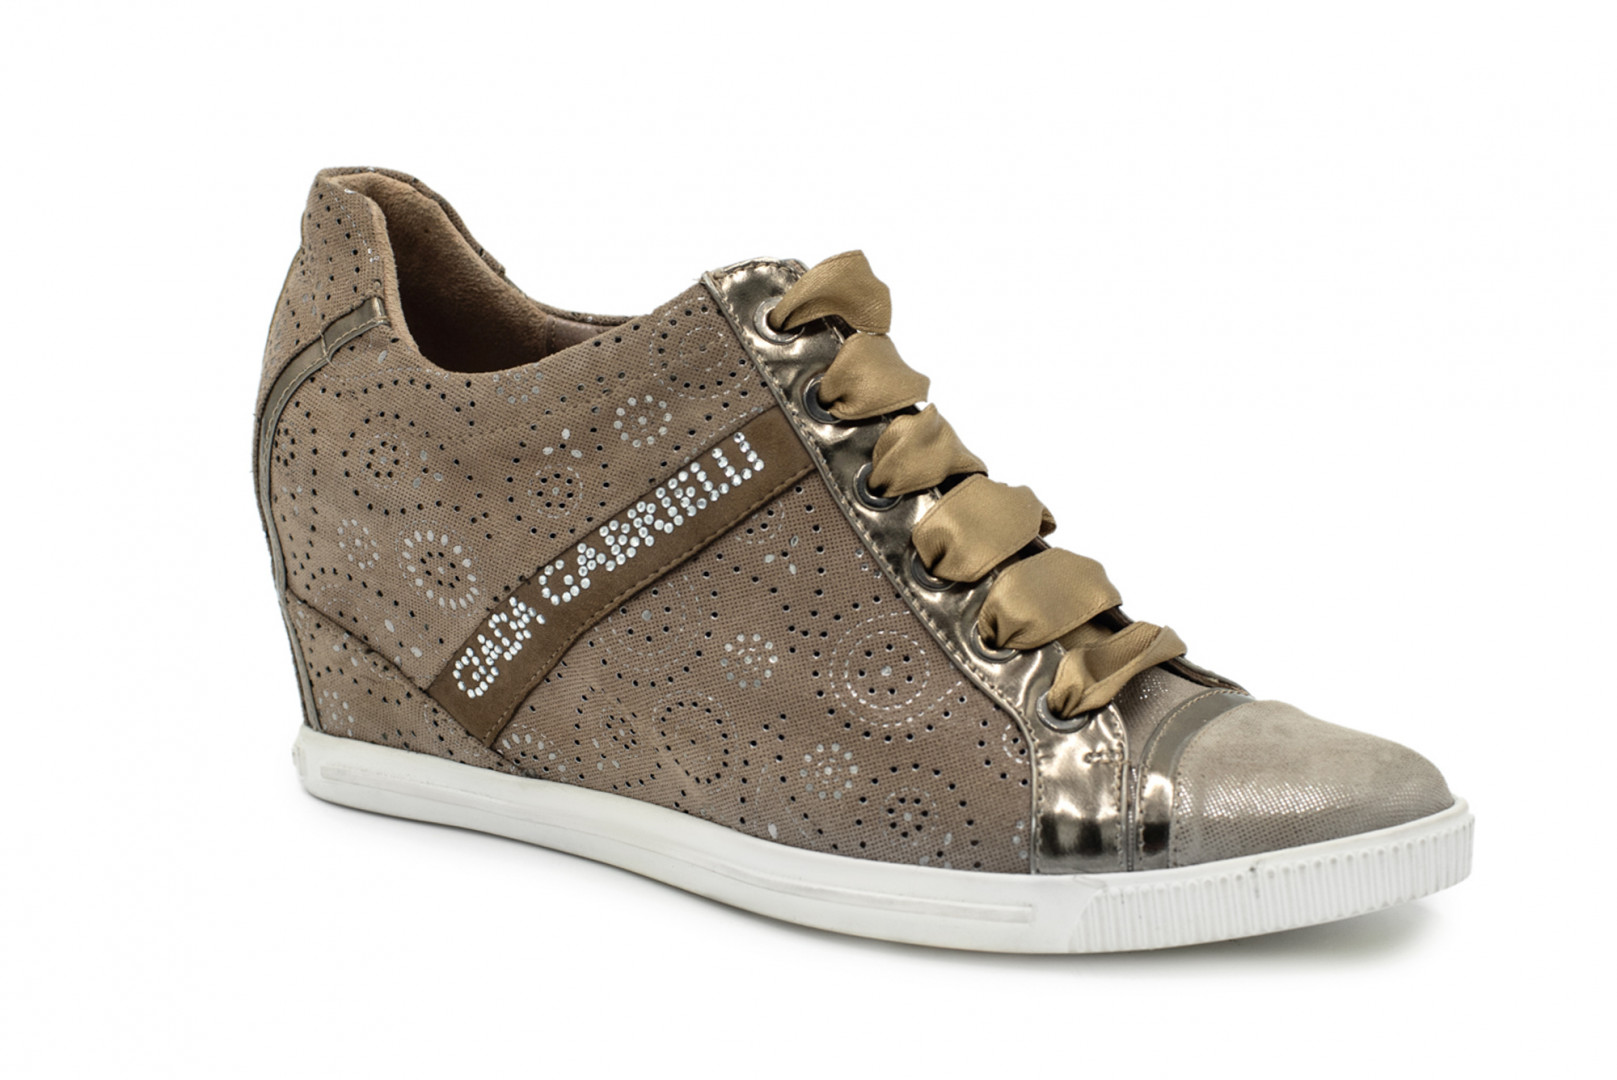 Обувь Габриэлла Италия Интернет Магазин